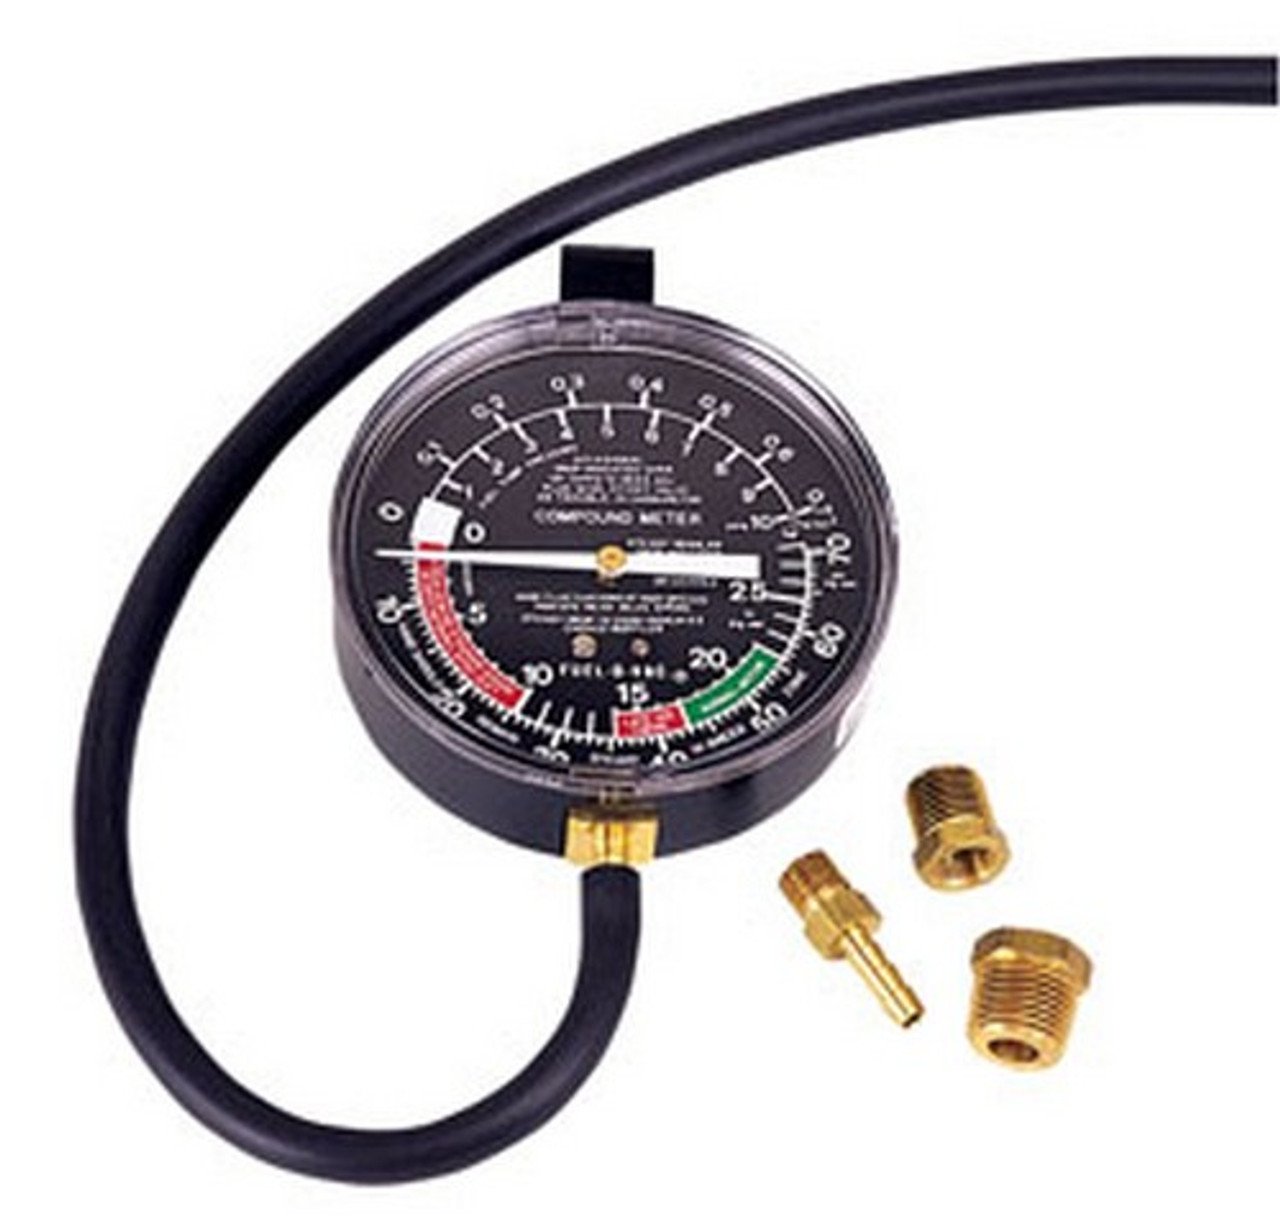 Lisle 20300 Vacuum Gauge and Fuel Pump Tester